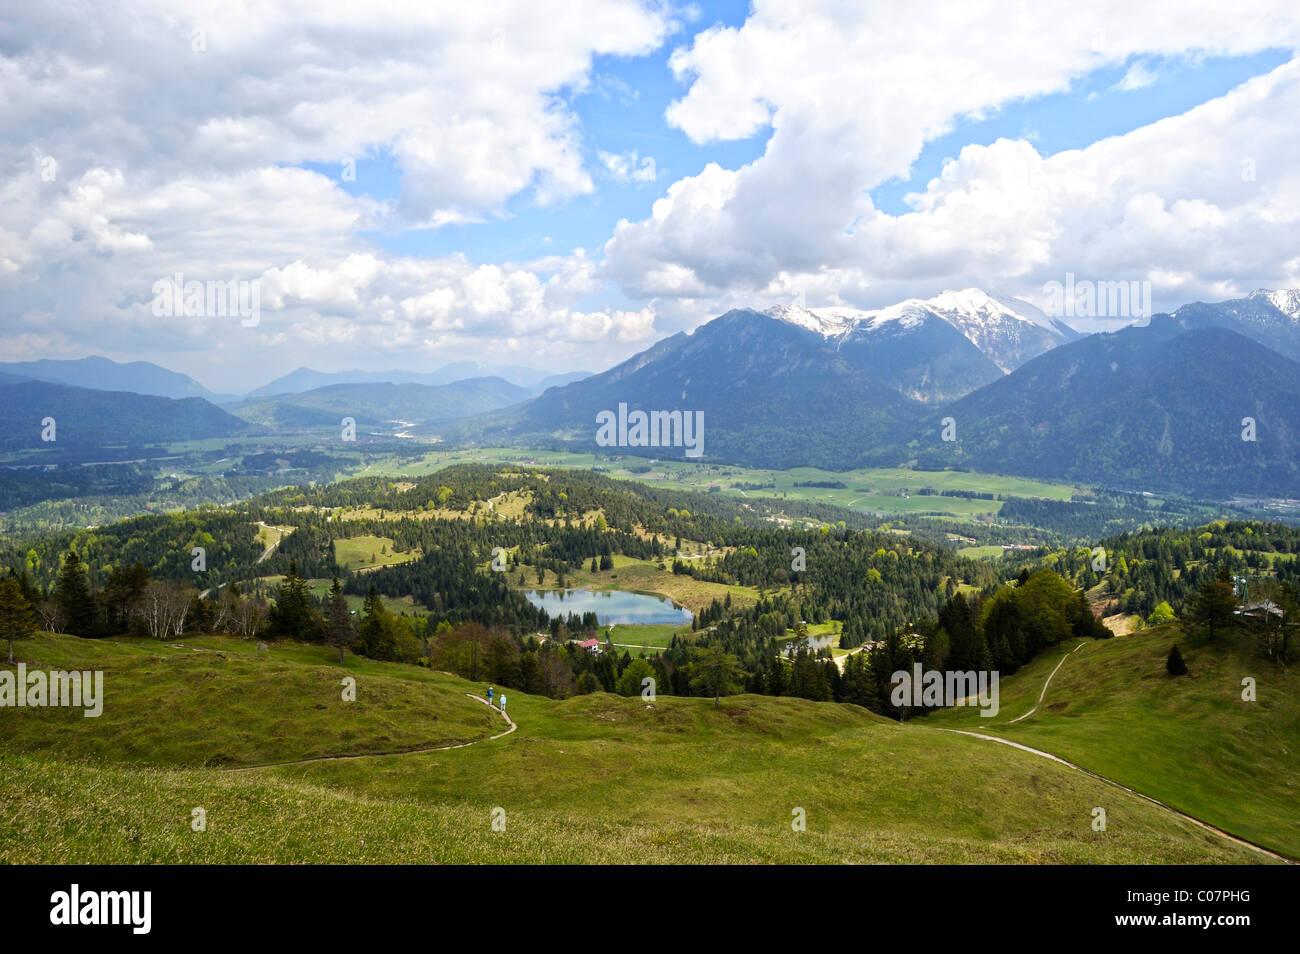 Vista desde la montaña Wildensee Kranzberg) en el lago, cordillera con Estergebirge Herzogstand Heimgarten Imagen De Stock